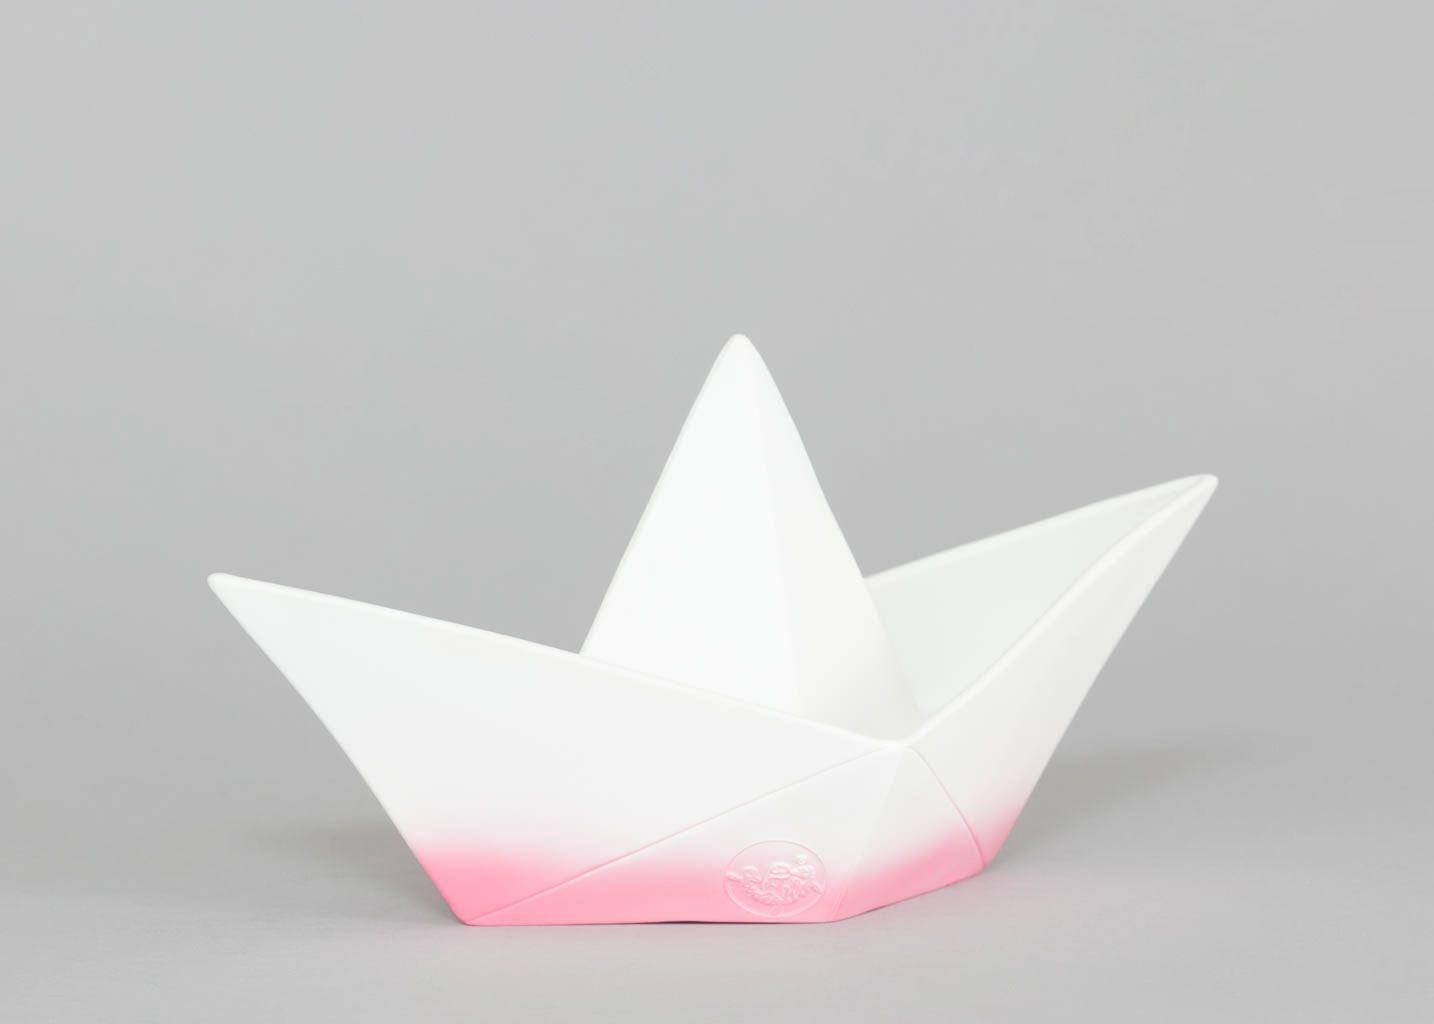 Veilleuse Bateau - Goodnight Light